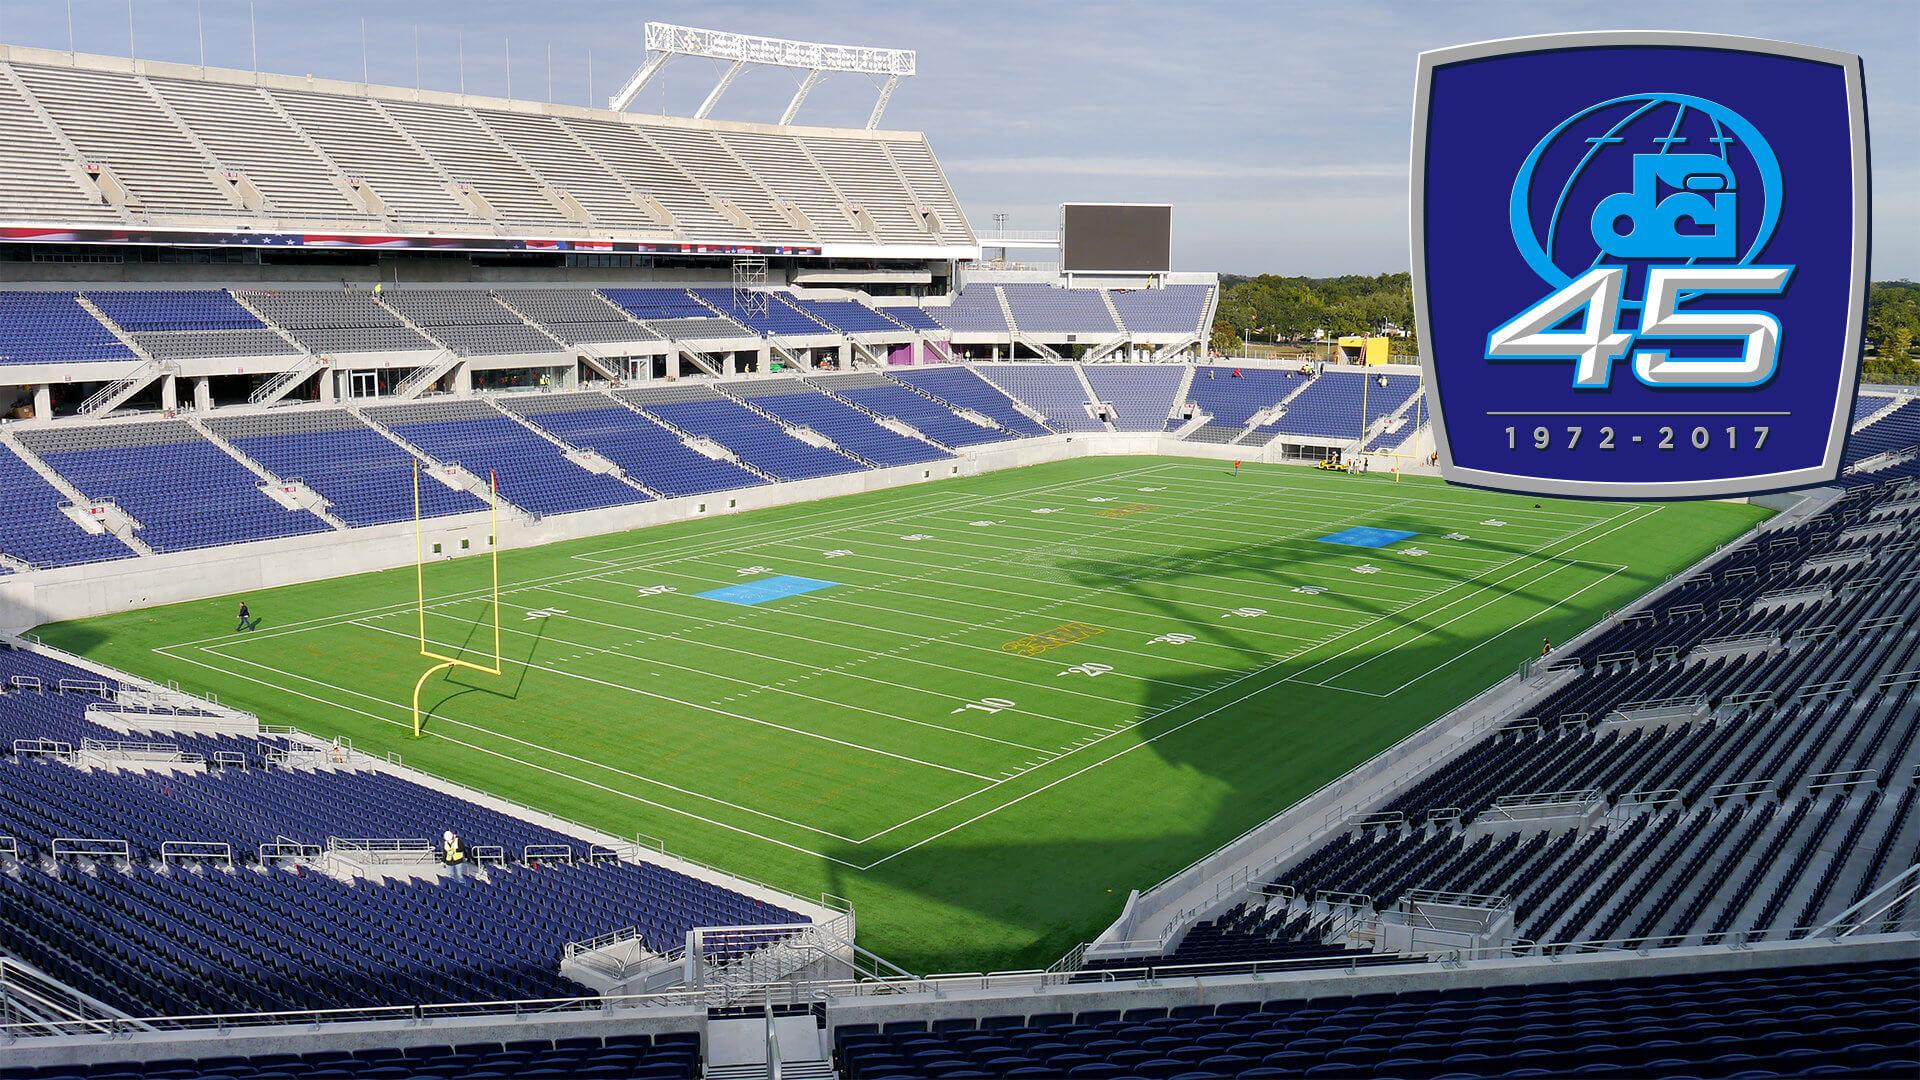 Details confirmed for 2017 Florida events